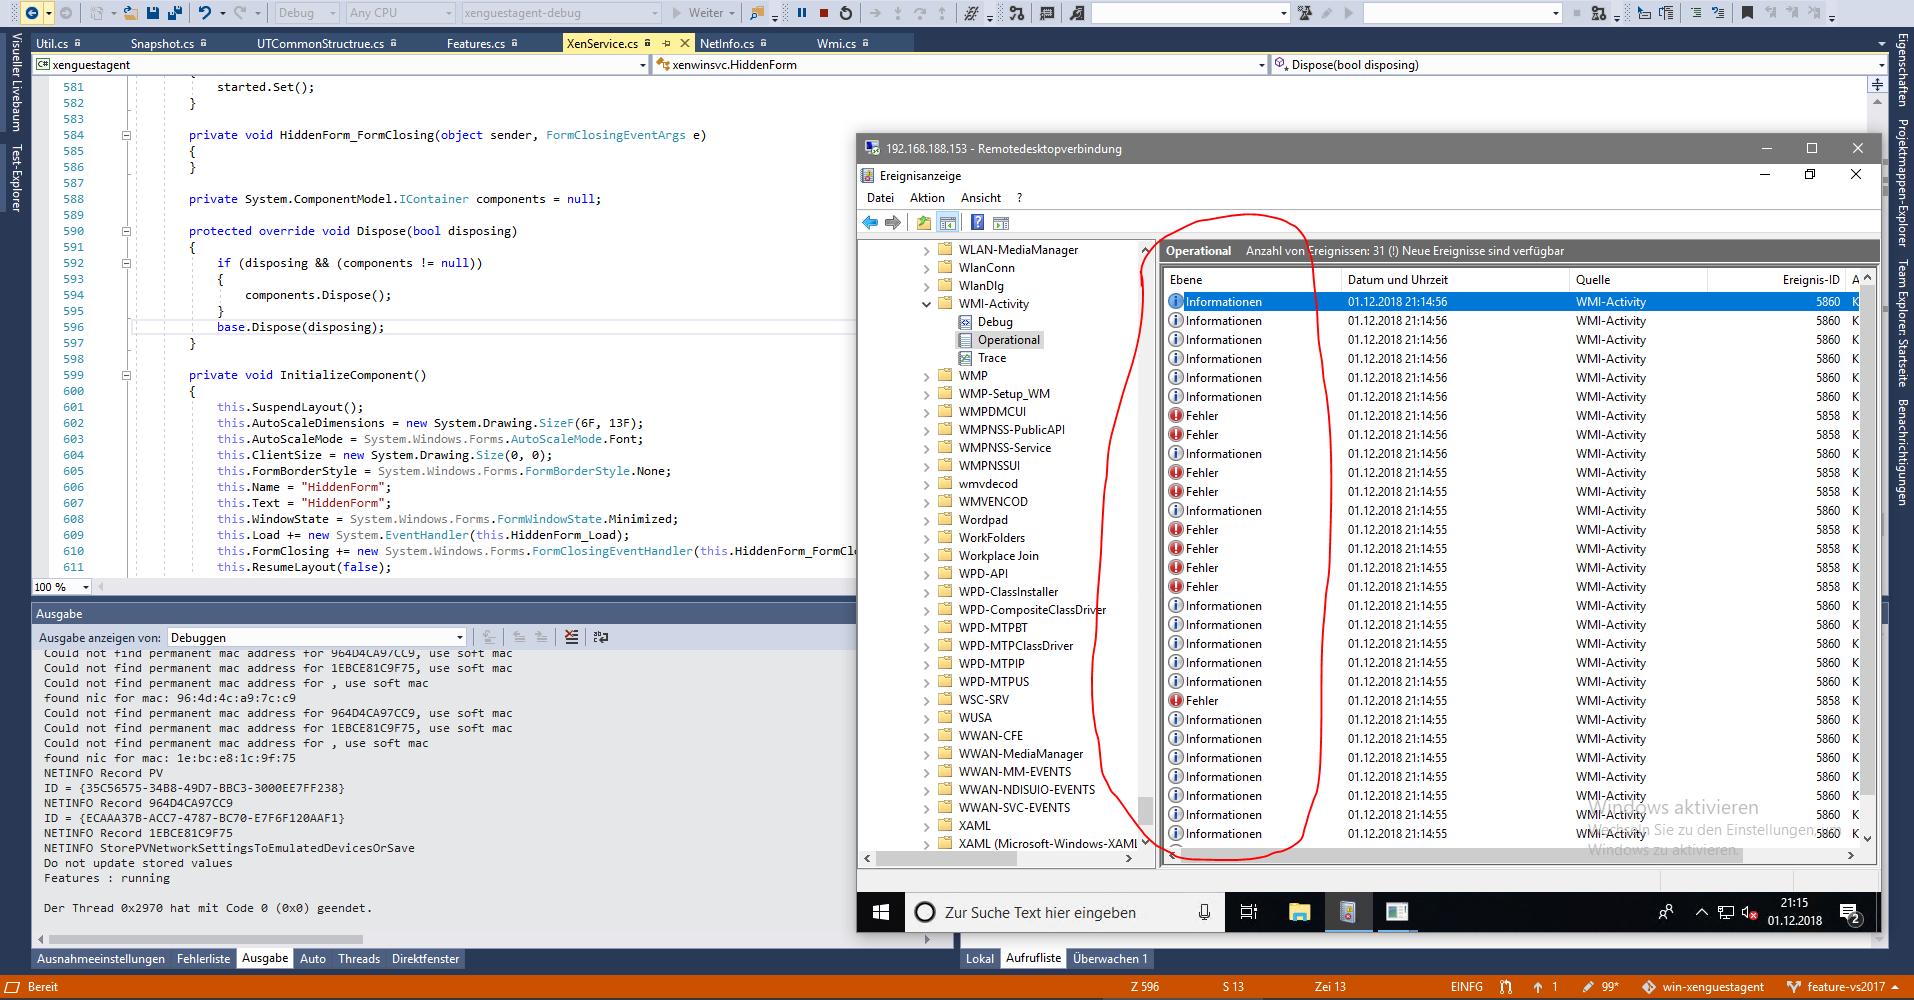 Beta Release] XCP-ng Windows Client tools 8 2 1-beta1   XCP